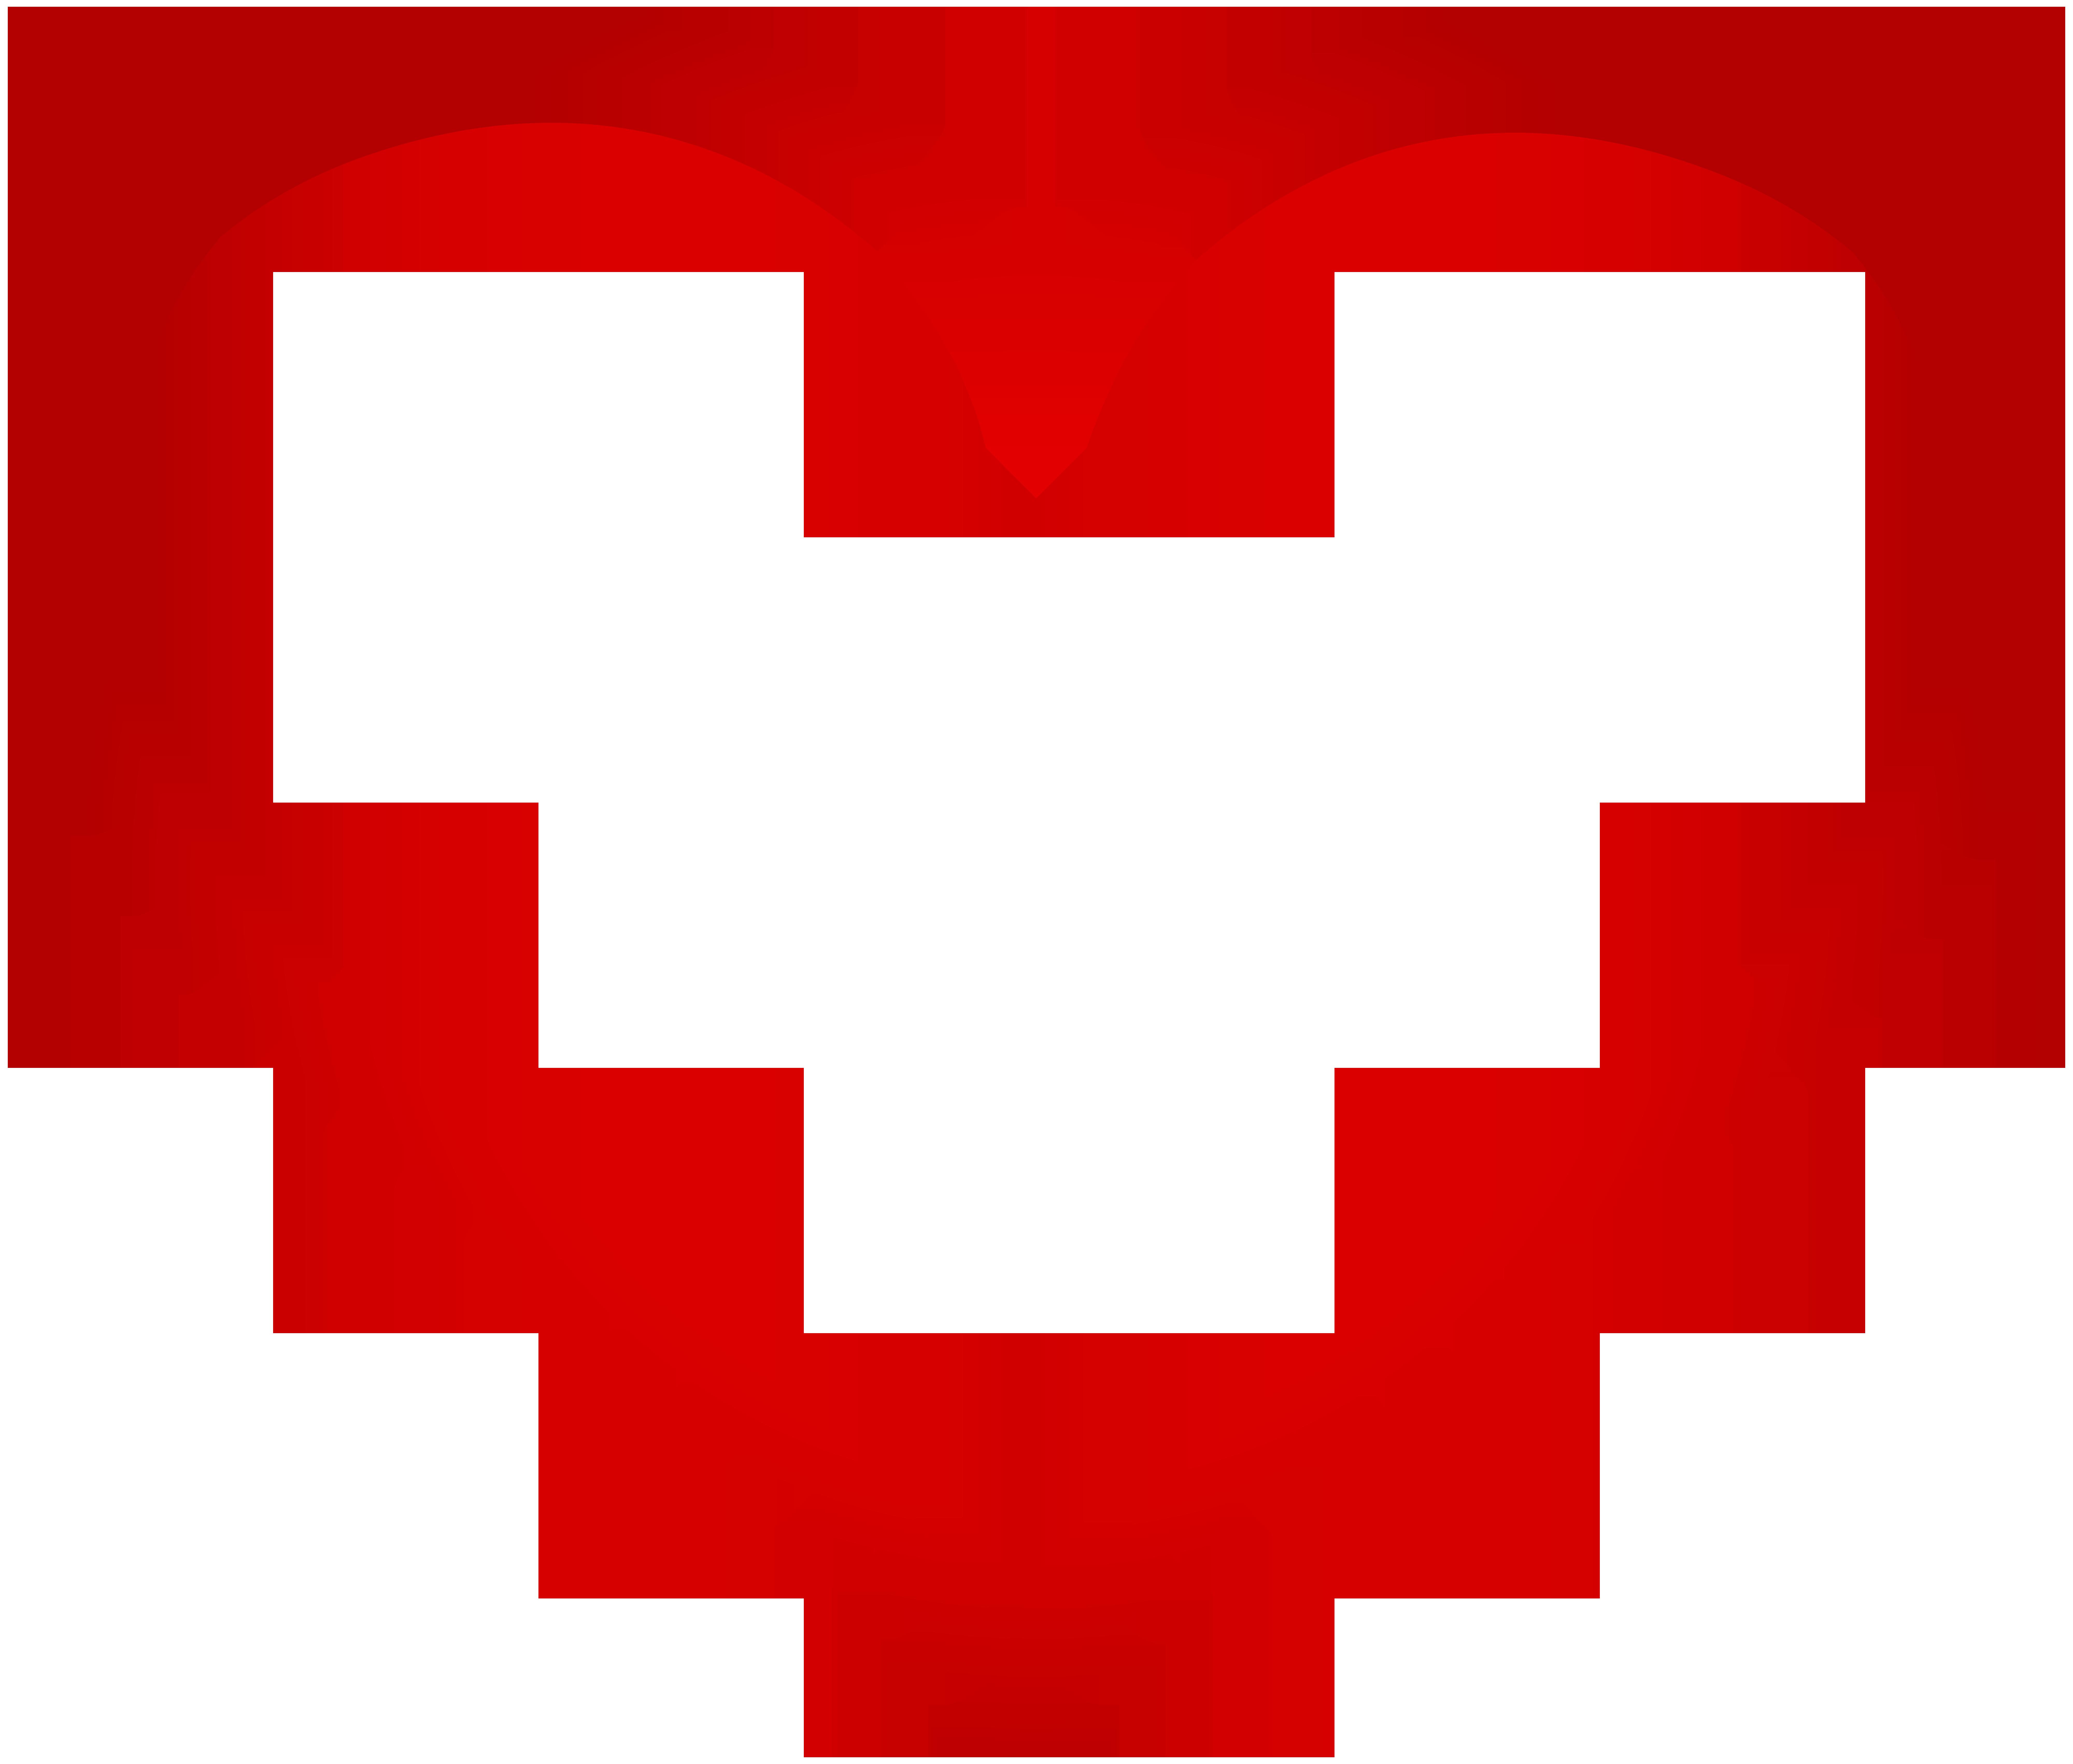 Red border frame transparent. Rock clipart heart